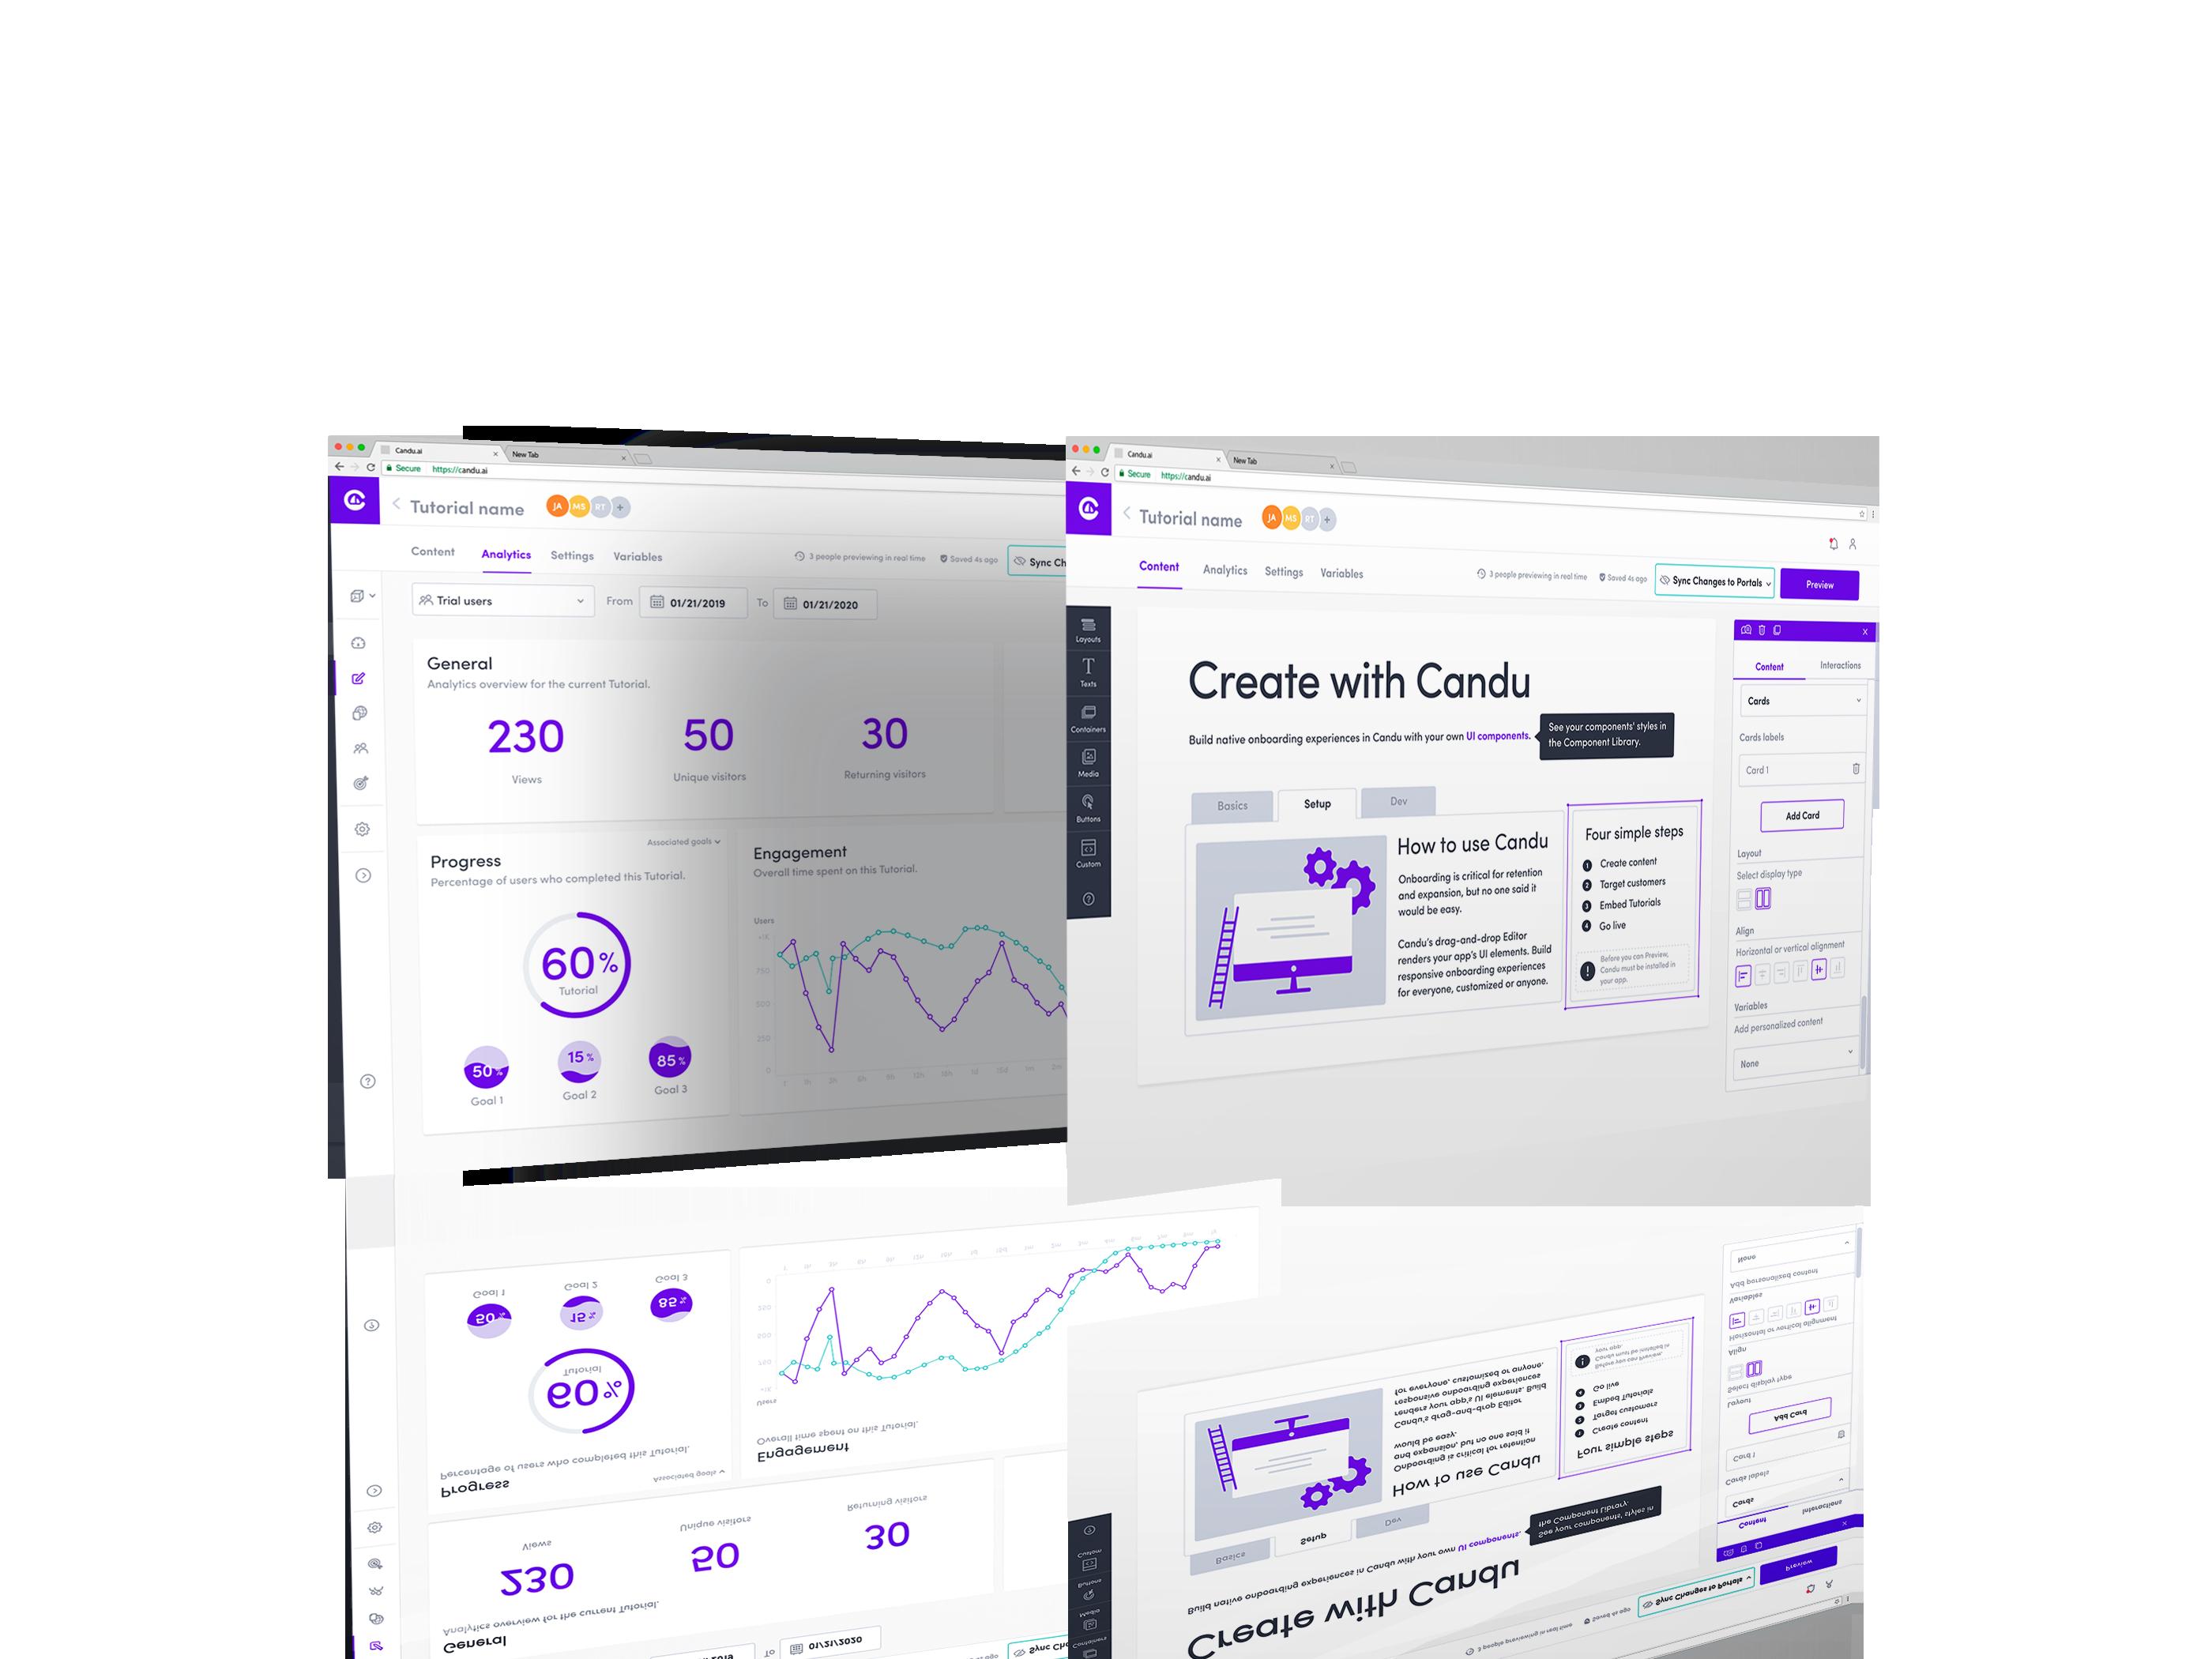 Screenshots of Candu's onboarding analytics and customer experience platforms.